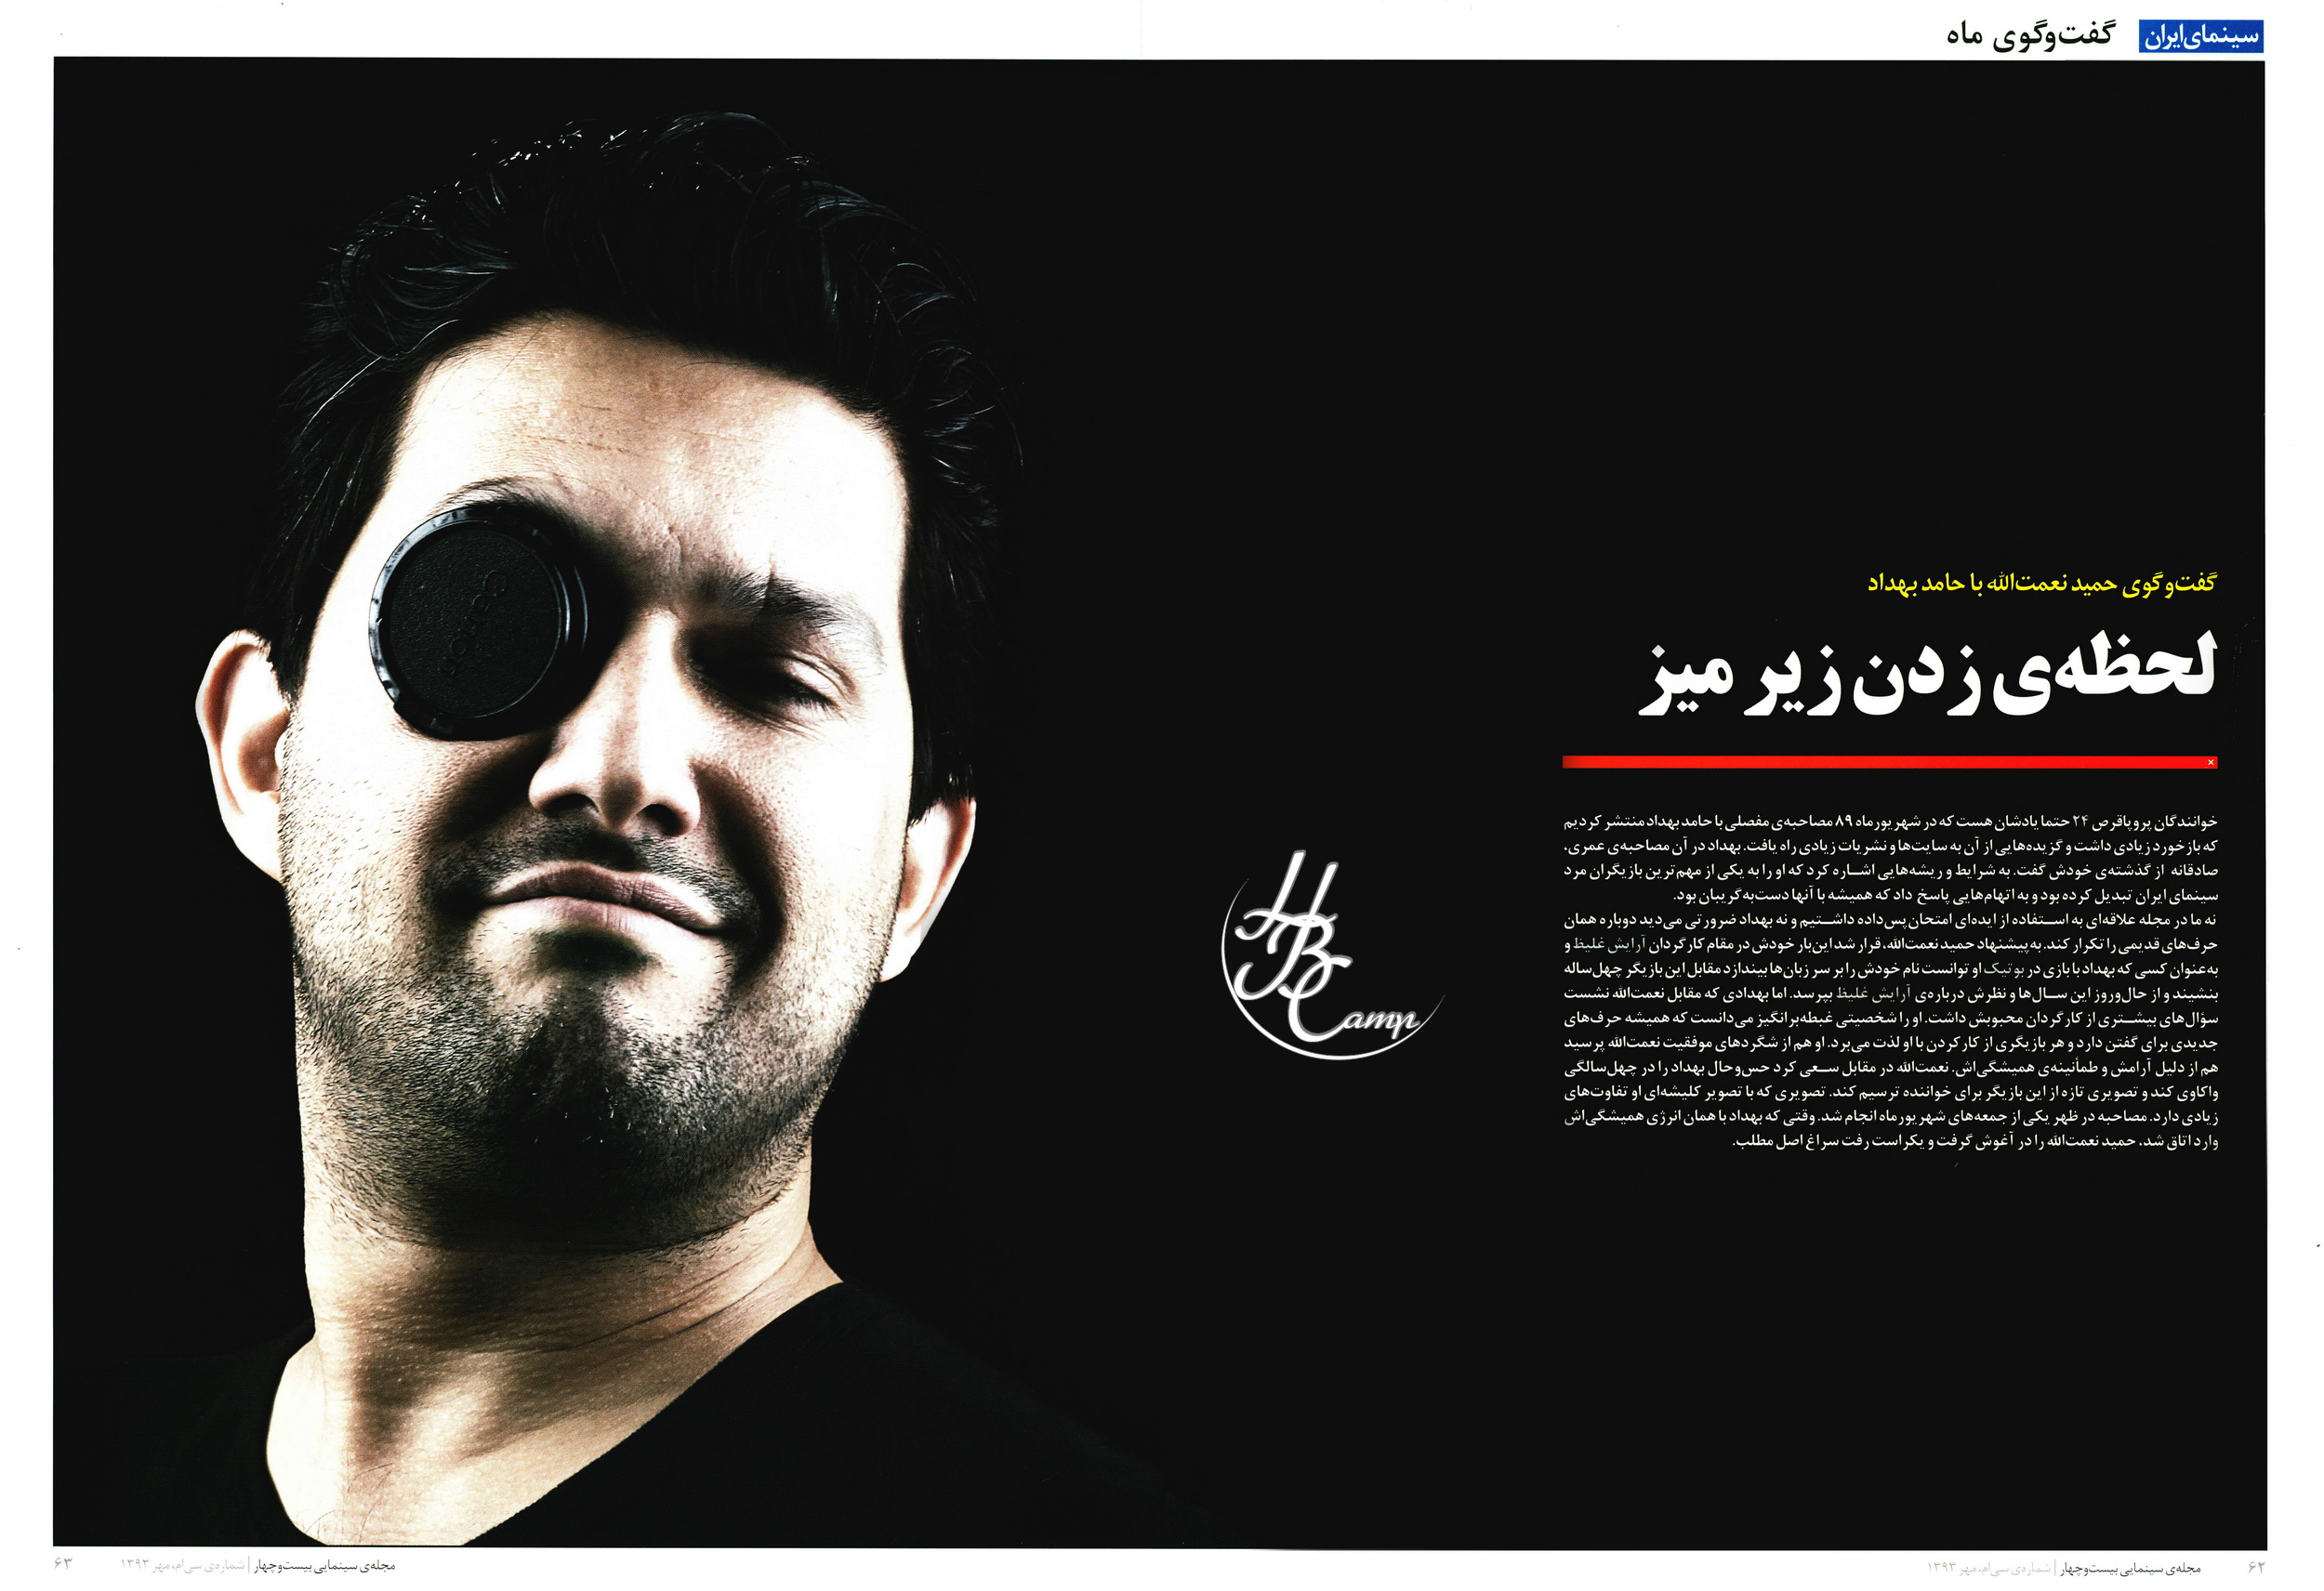 http://yotab.persiangig.com/magazin/24mag-56/00.jpg